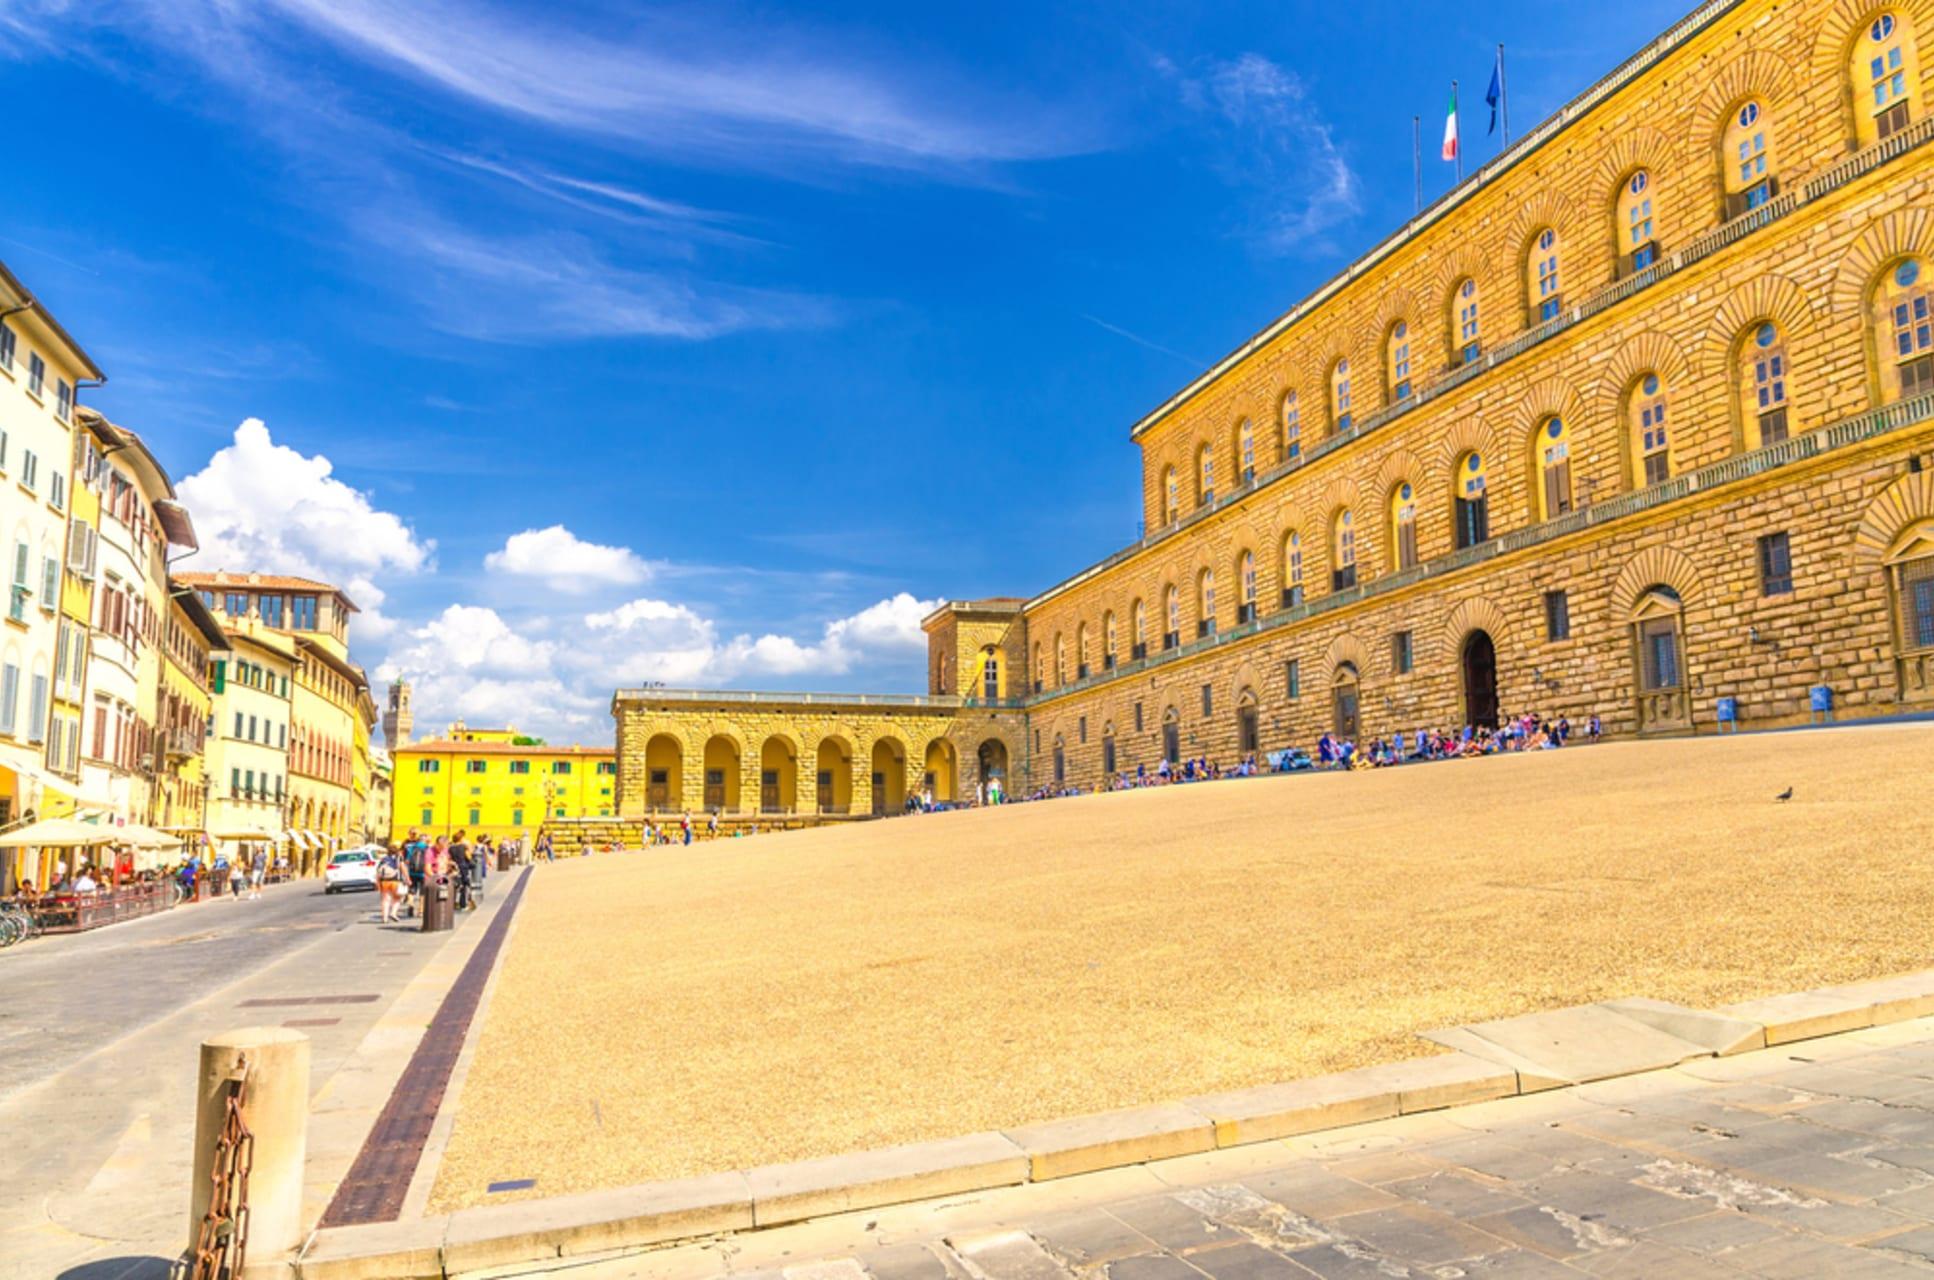 Florence - Pitti Palace and the origin of modern Italian fashion